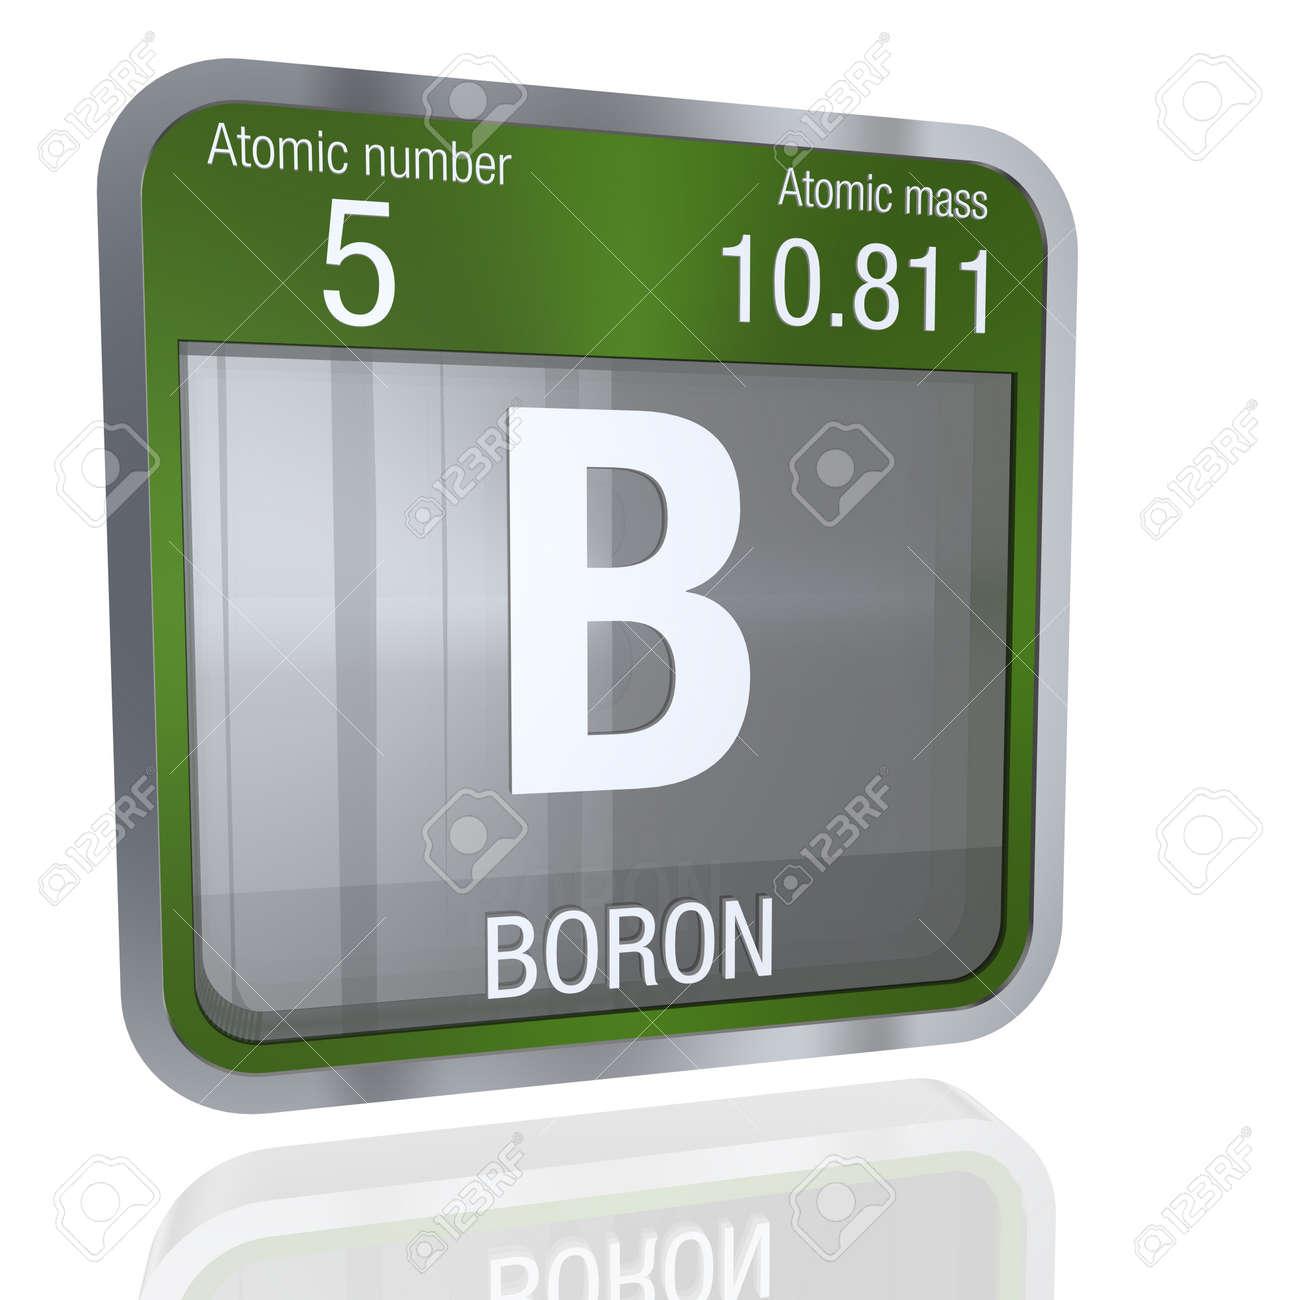 Boron Symbol In Square Shape With Metallic Border And Transparent